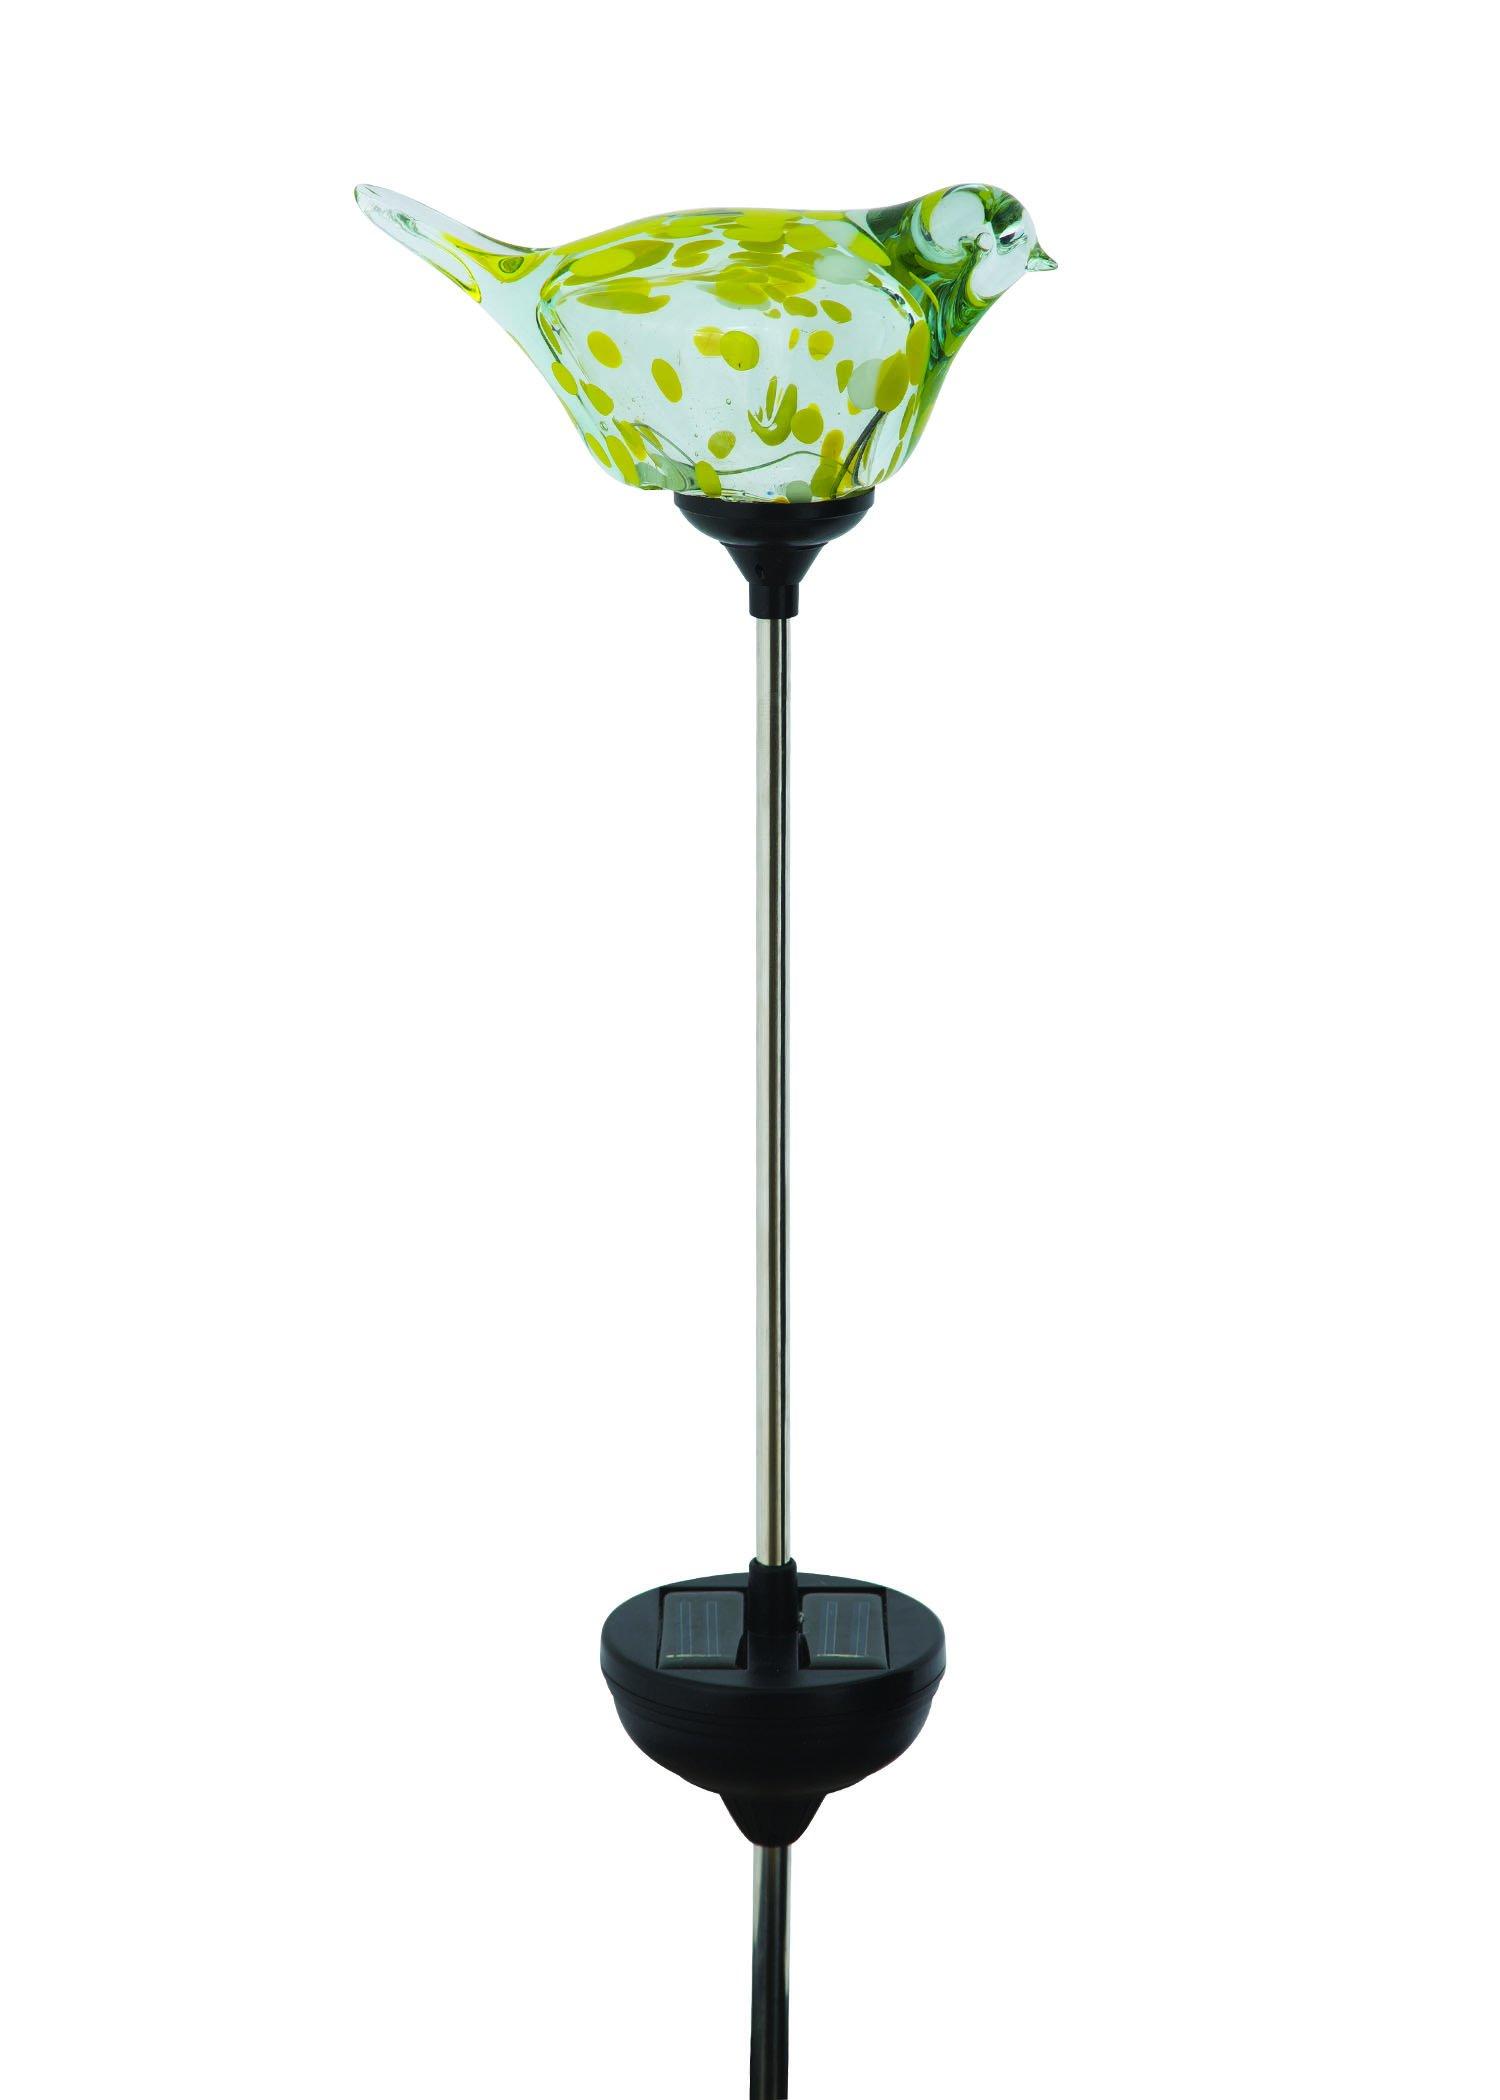 Russco III GS137029 Solar Powered LED Glass Bird Garden Stake, Yellow